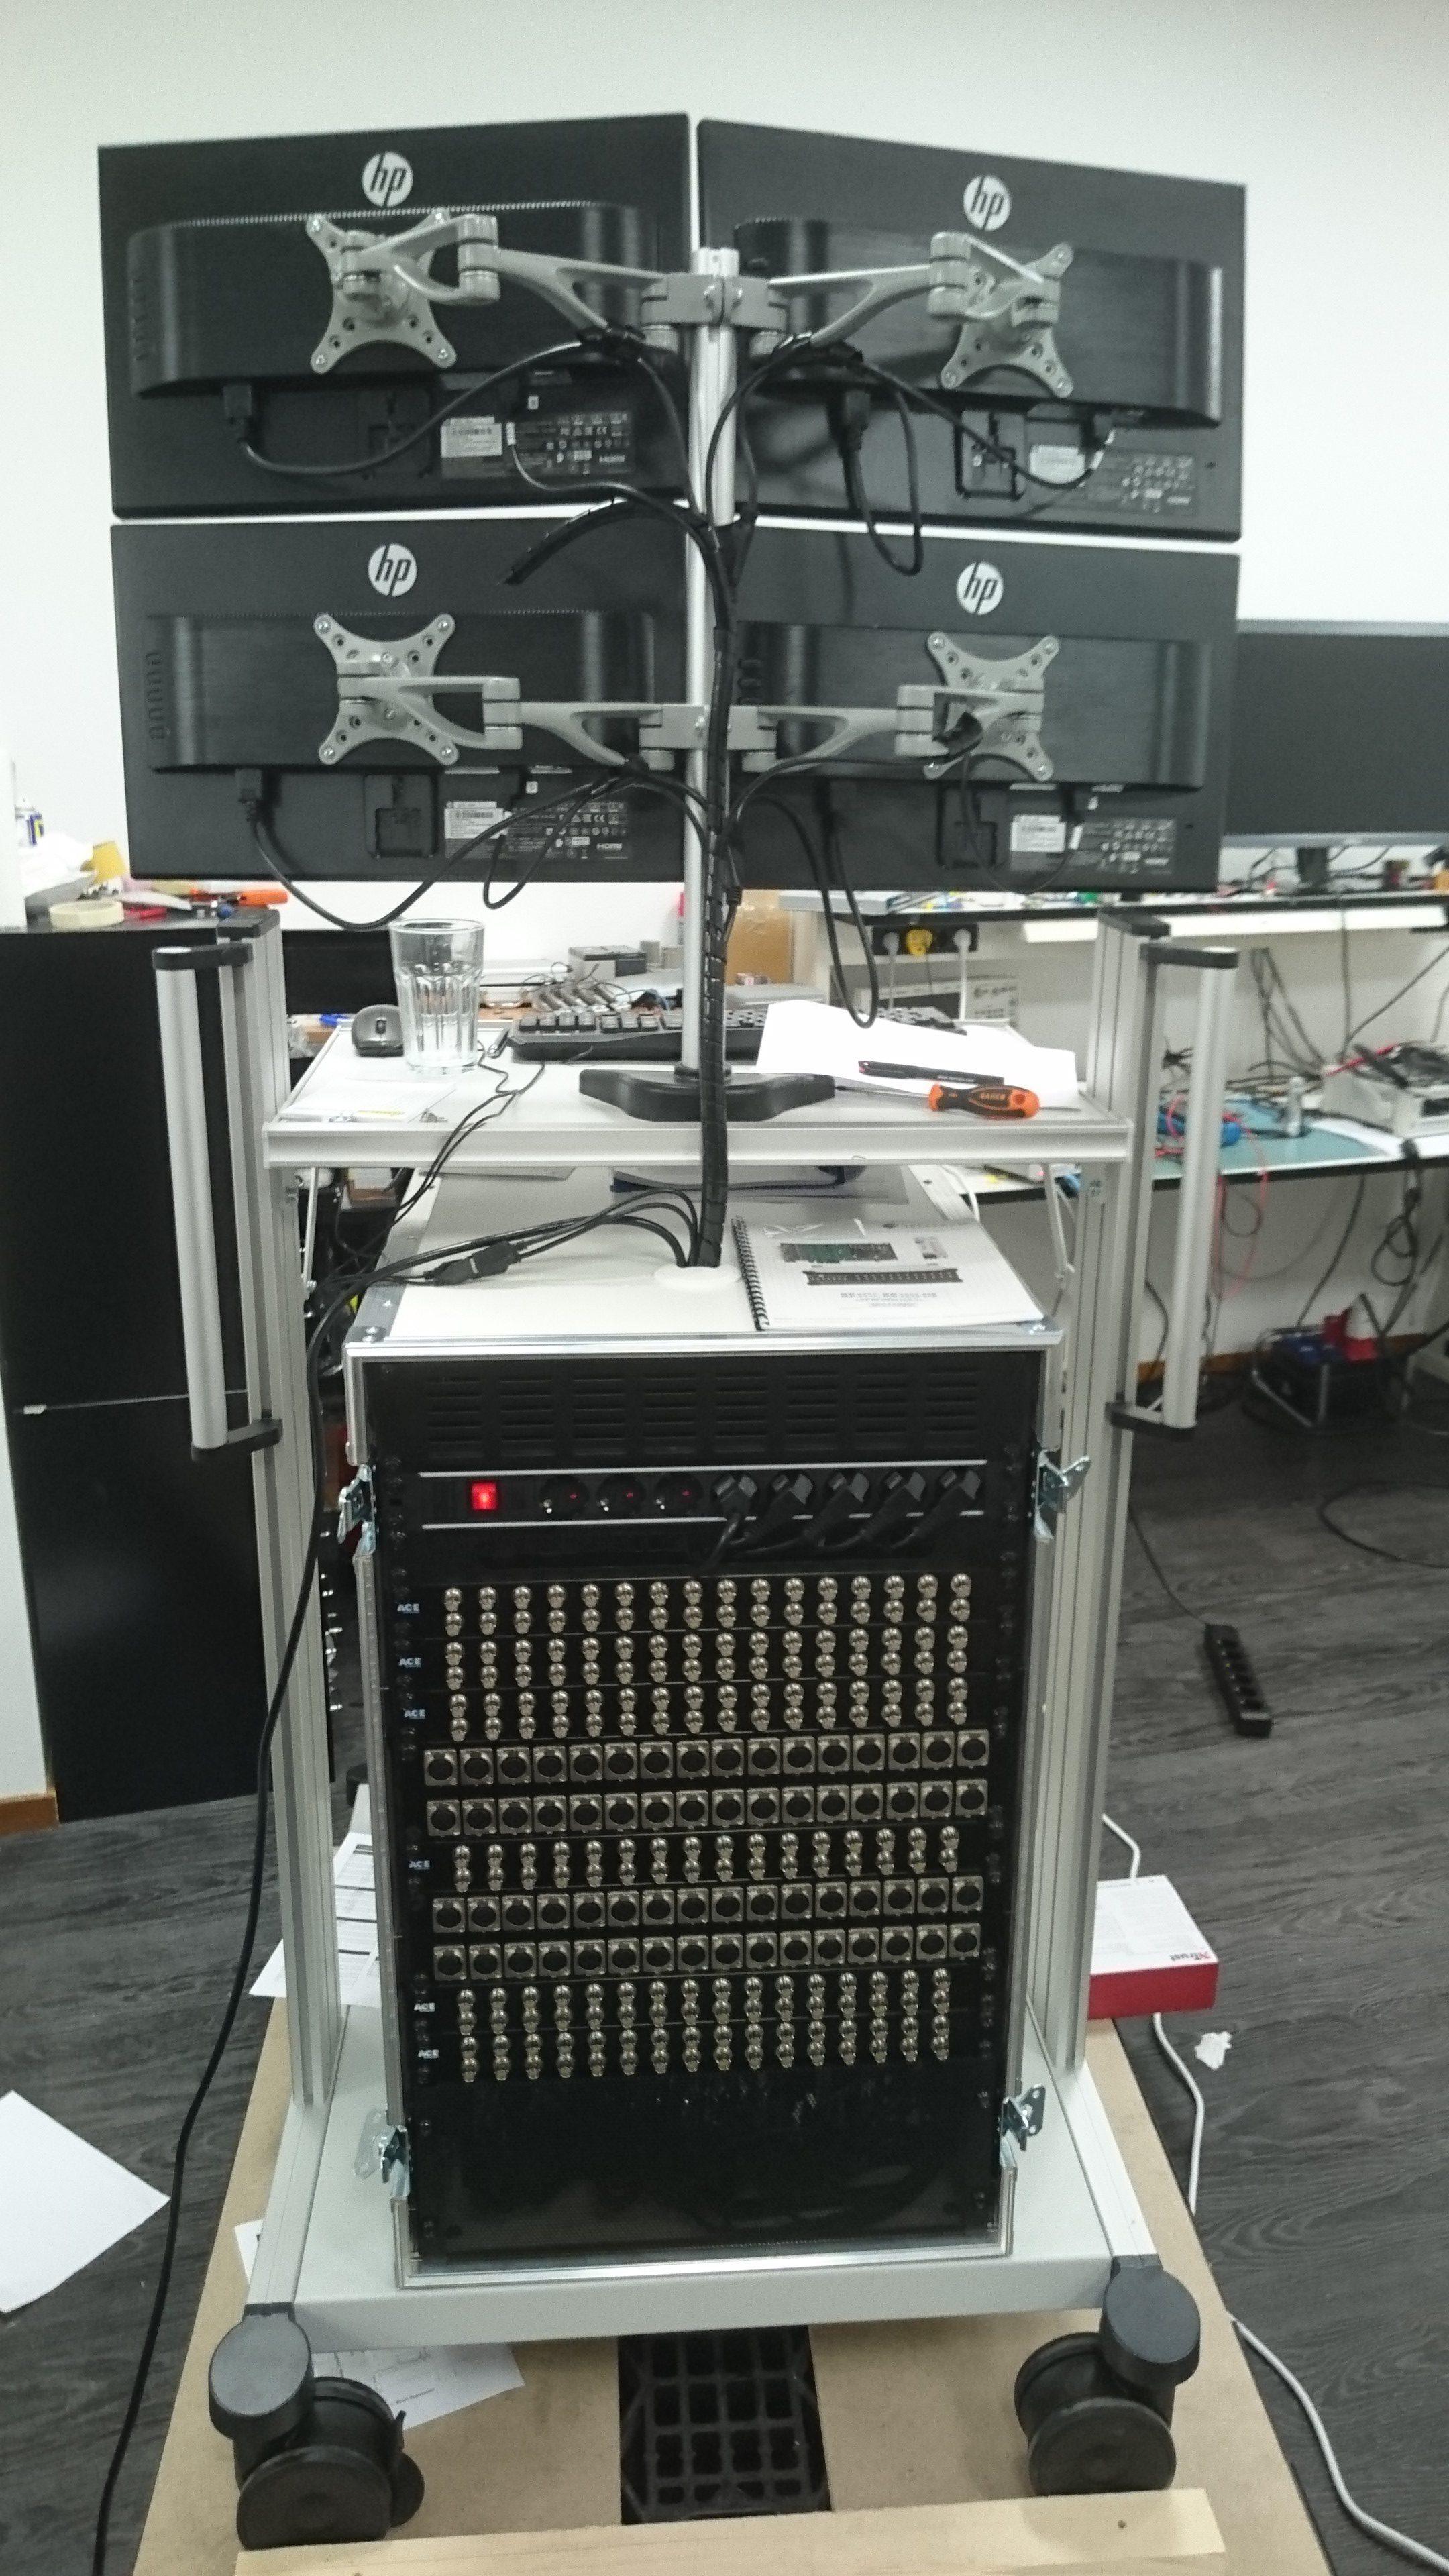 192 kanaals datalogger